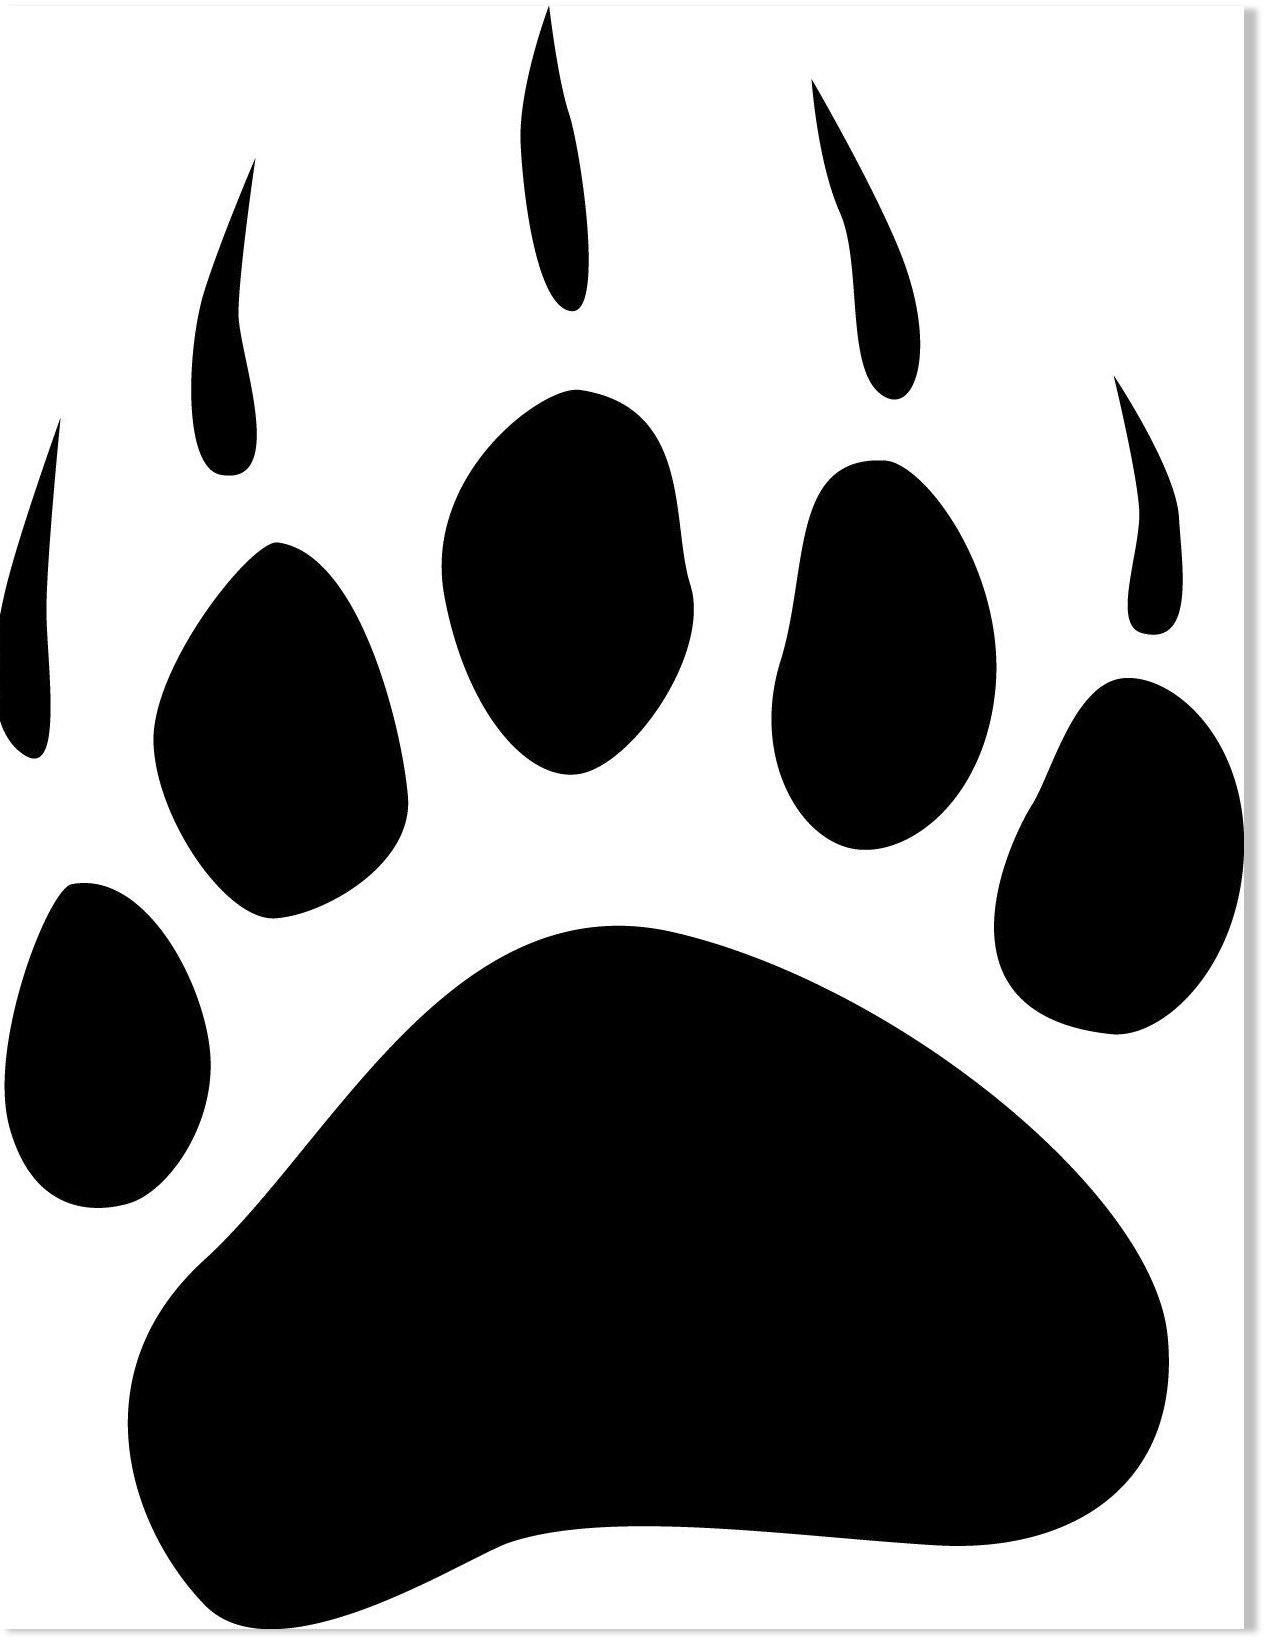 Bear mauls 6 people in Odisha, India -- Earth Changes ... (1264 x 1641 Pixel)